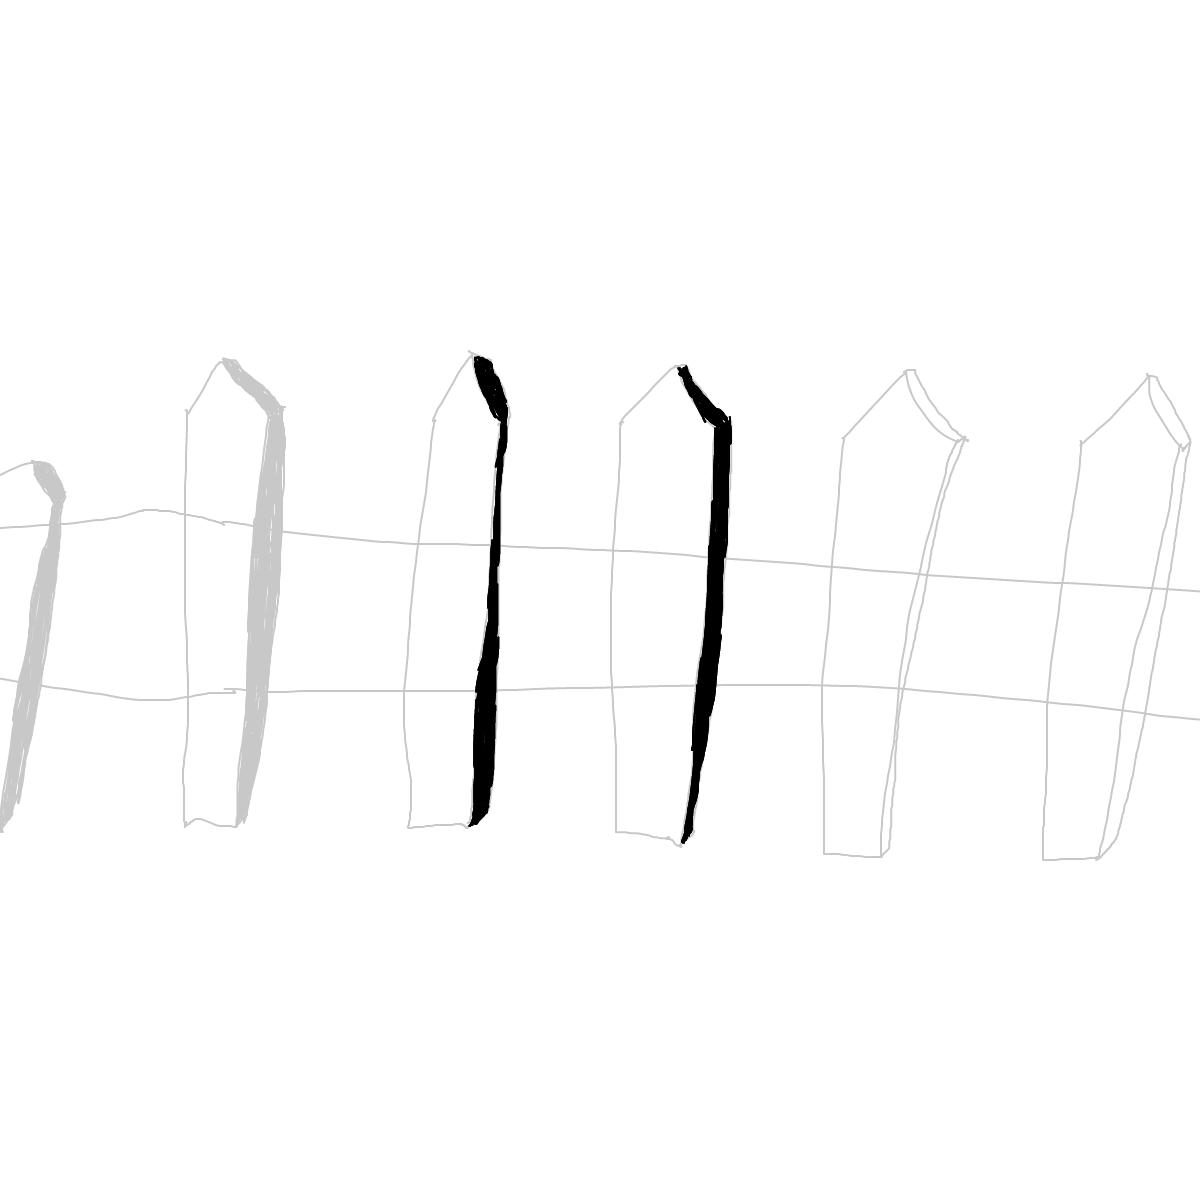 BAAAM drawing#9153 lat:52.4750595092773440lng: 13.4070529937744140